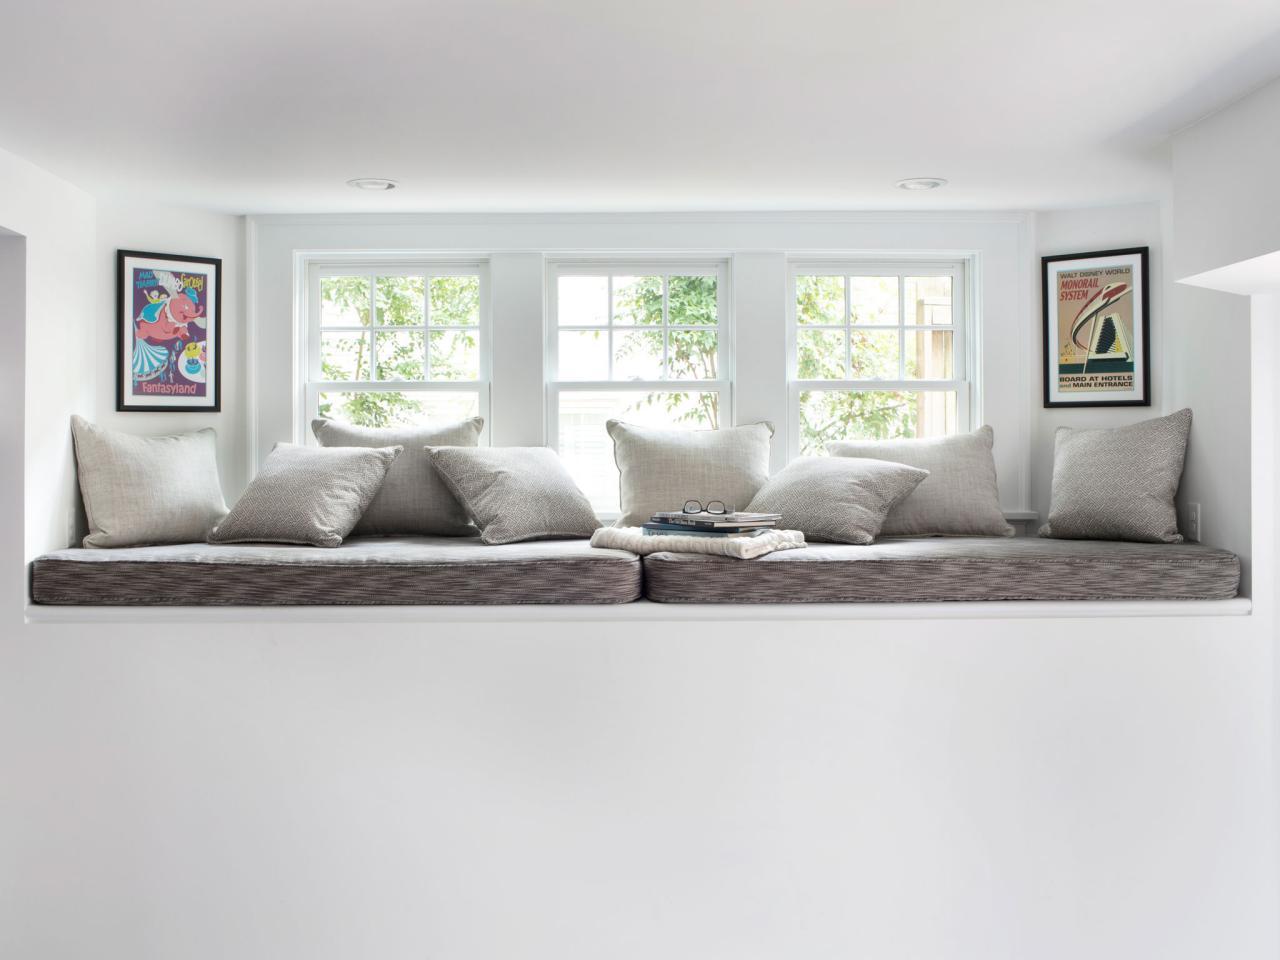 14 smart design ideas for underused basements | hgtv's decorating